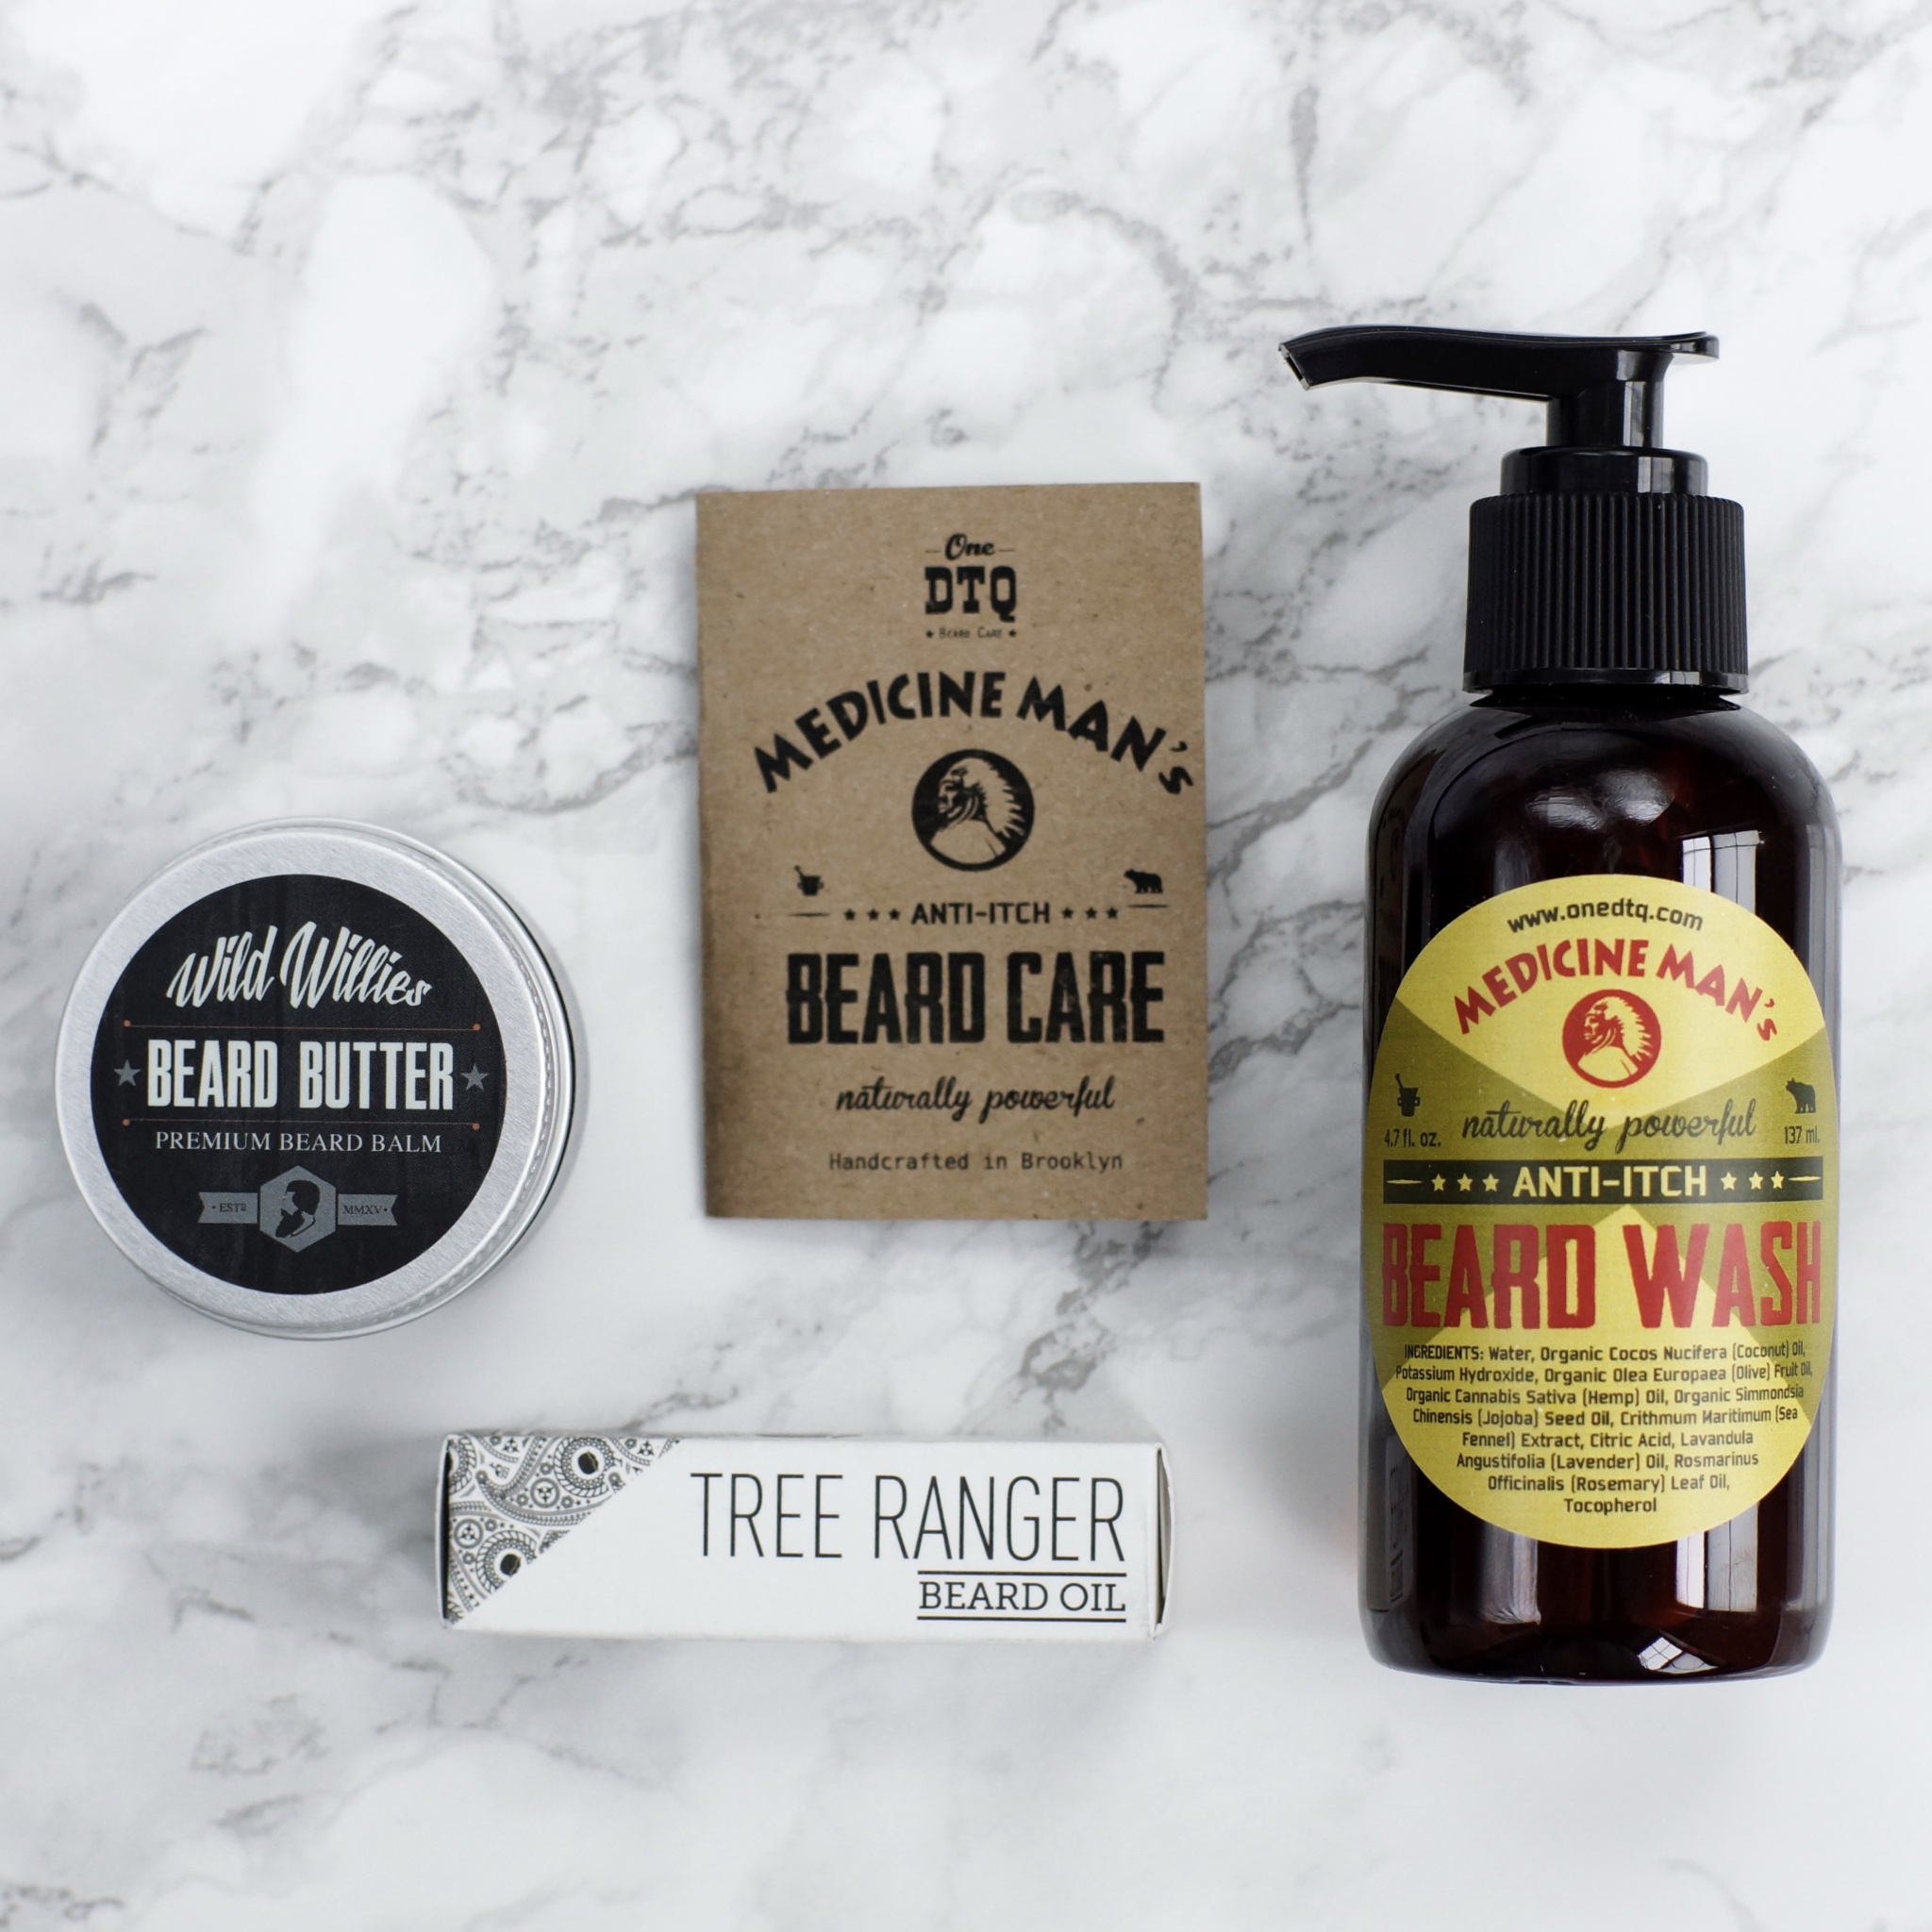 - Beard Wash - DTQ Beard Care - Medicine Man's Anti-Itch Beard Wash - onedtq.com - The Manskape Co. Wild Willies Beard Butter Balm - wild-willies.com - BeardBrand - beardbrand.com - Tree Ranger Beard Oil - Anti Itch - TheKillerLook.com - The Killer Look